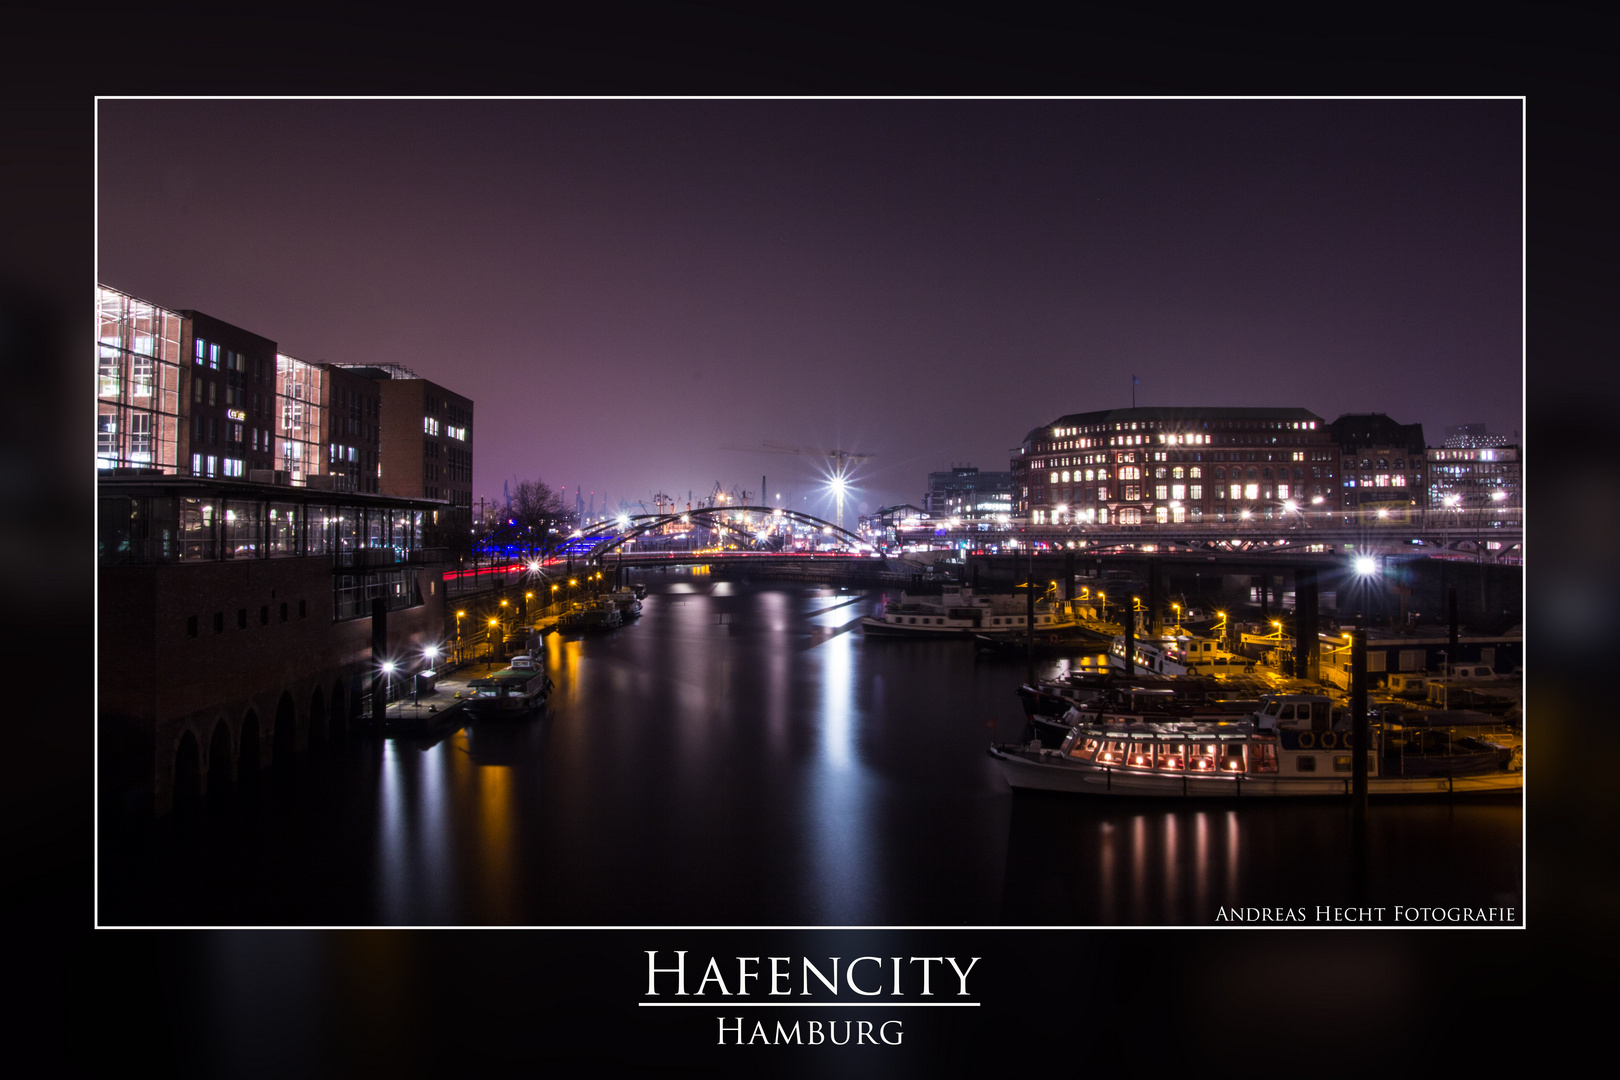 Hafencity 2